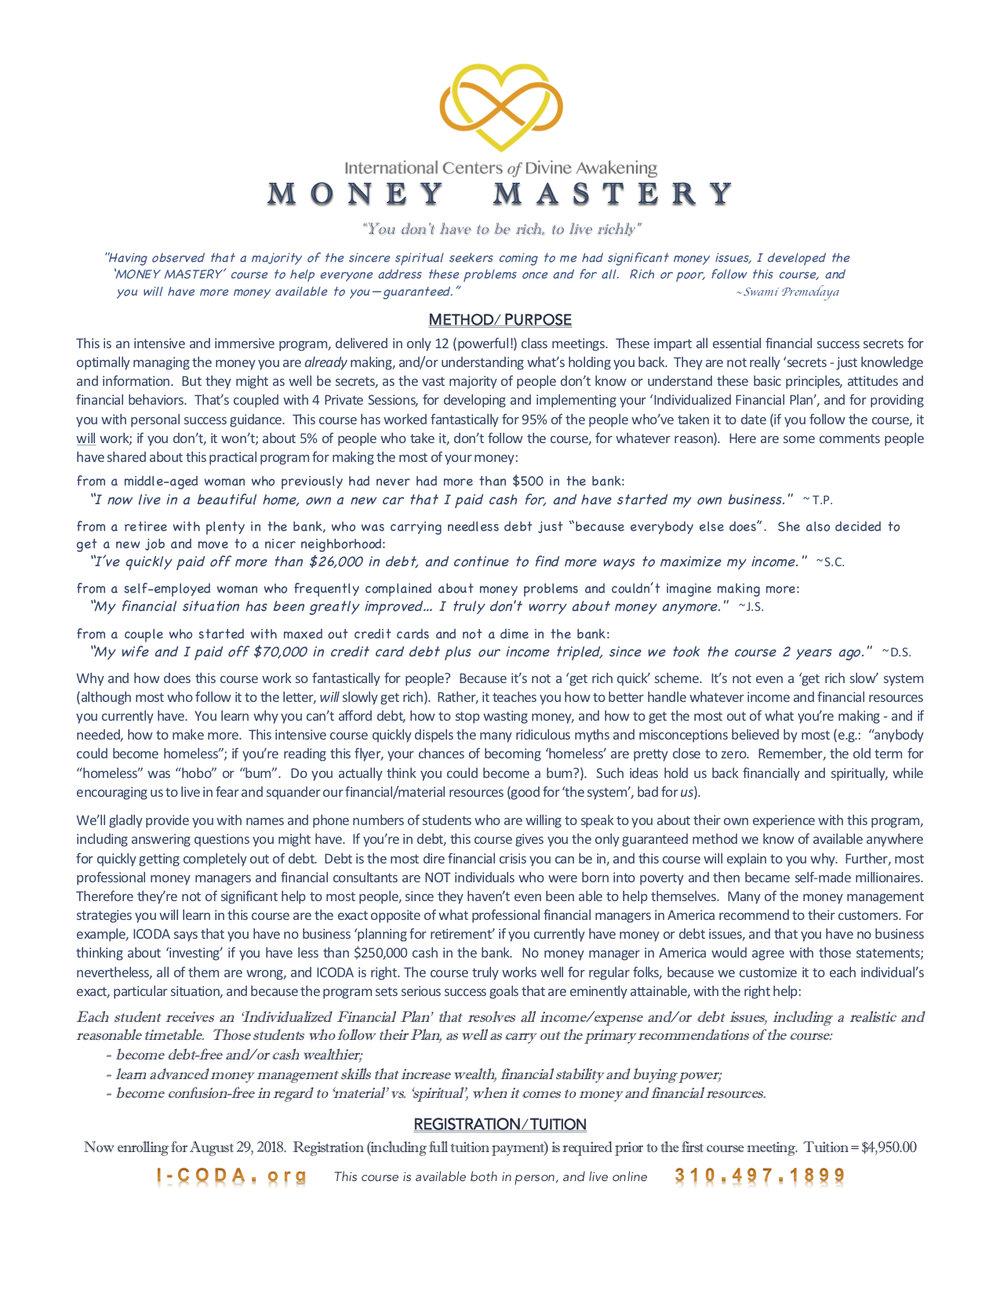 Money Mastery information.jpg